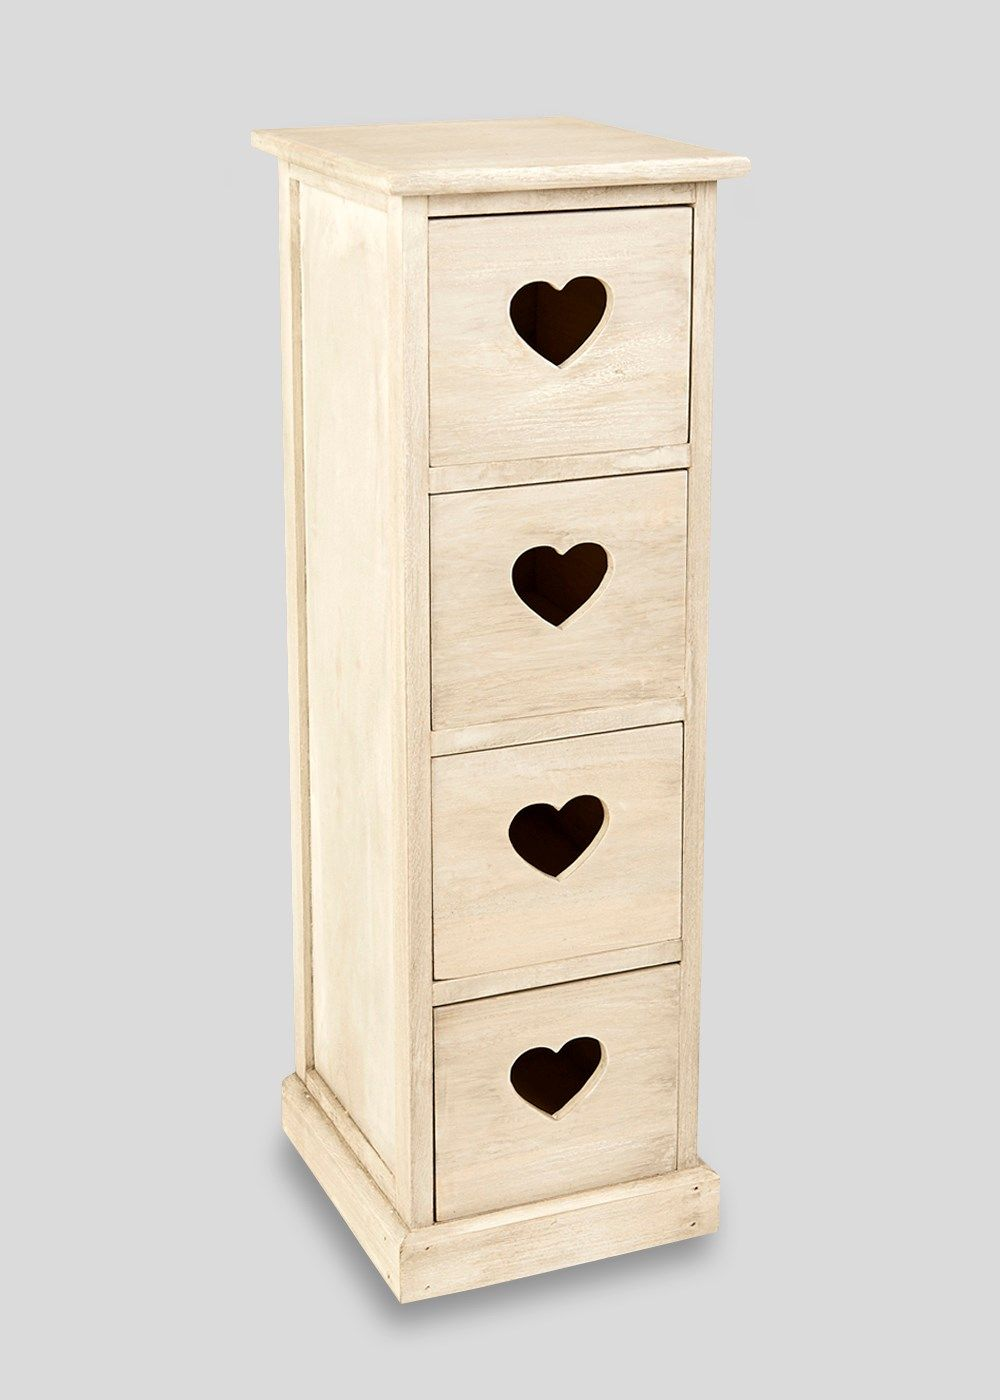 4 Drawer Wooden Storage Unit (80cm x 29cm x 25cm | Drawers, Drawer ...